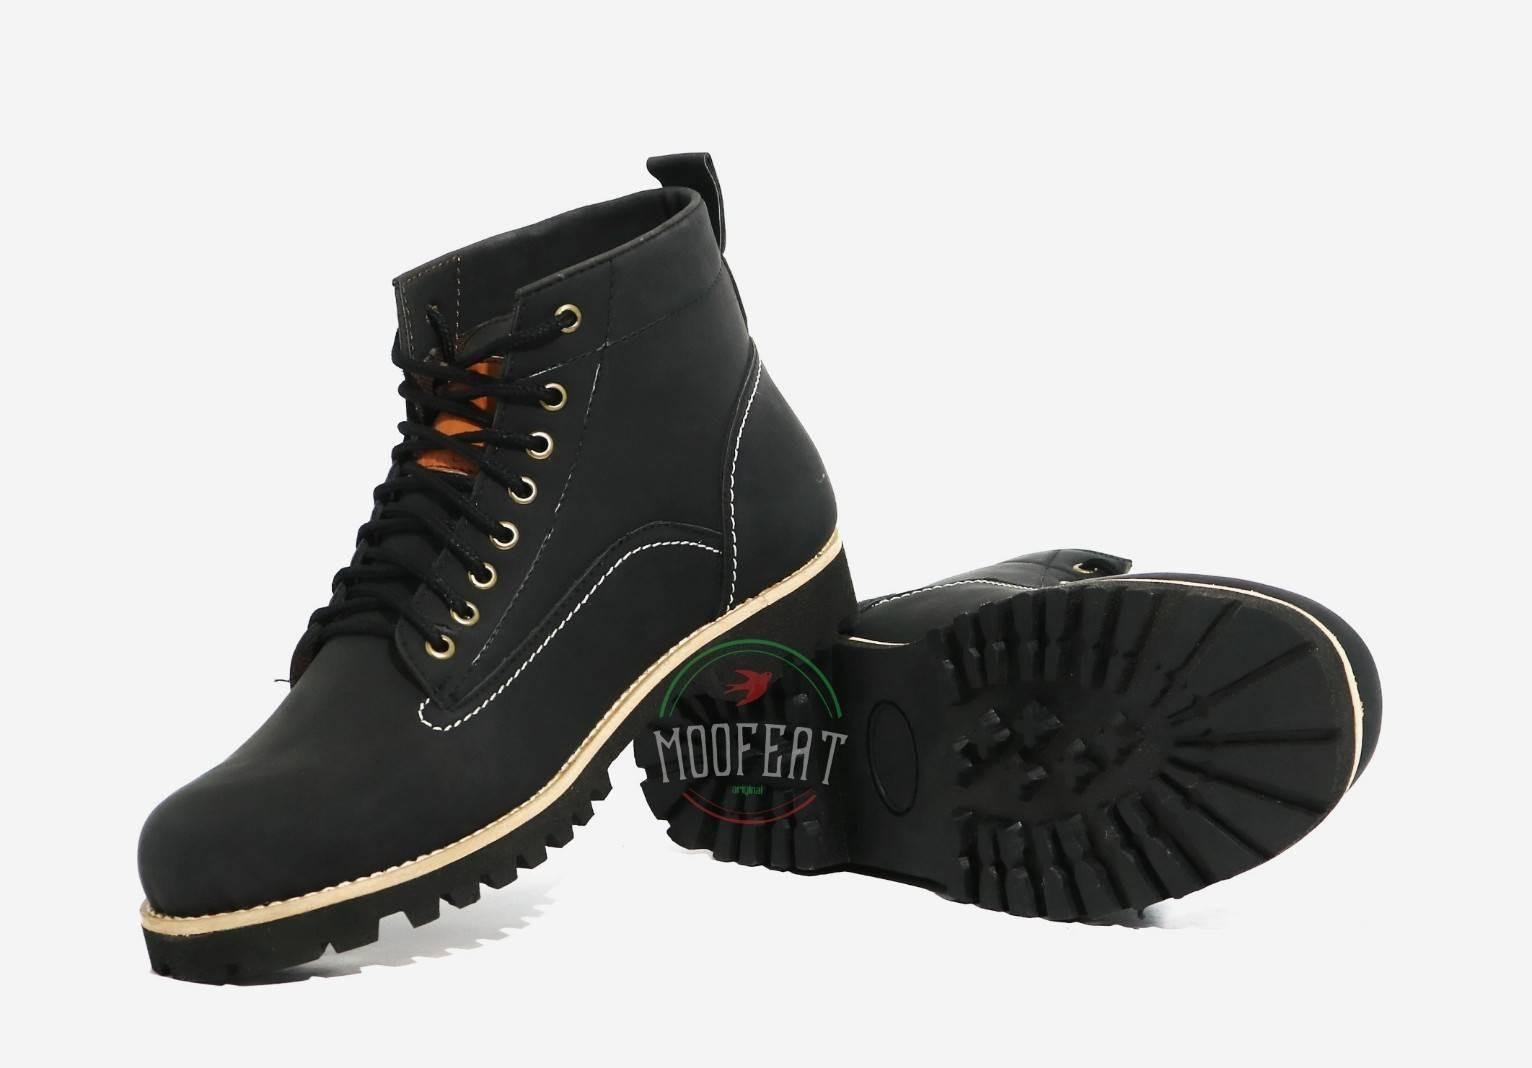 Sepatu Boots Pria Moofeat Edward Ring Hitam Original Clothing Kerja Pria  Work   Style High Quality 28d285ff6d